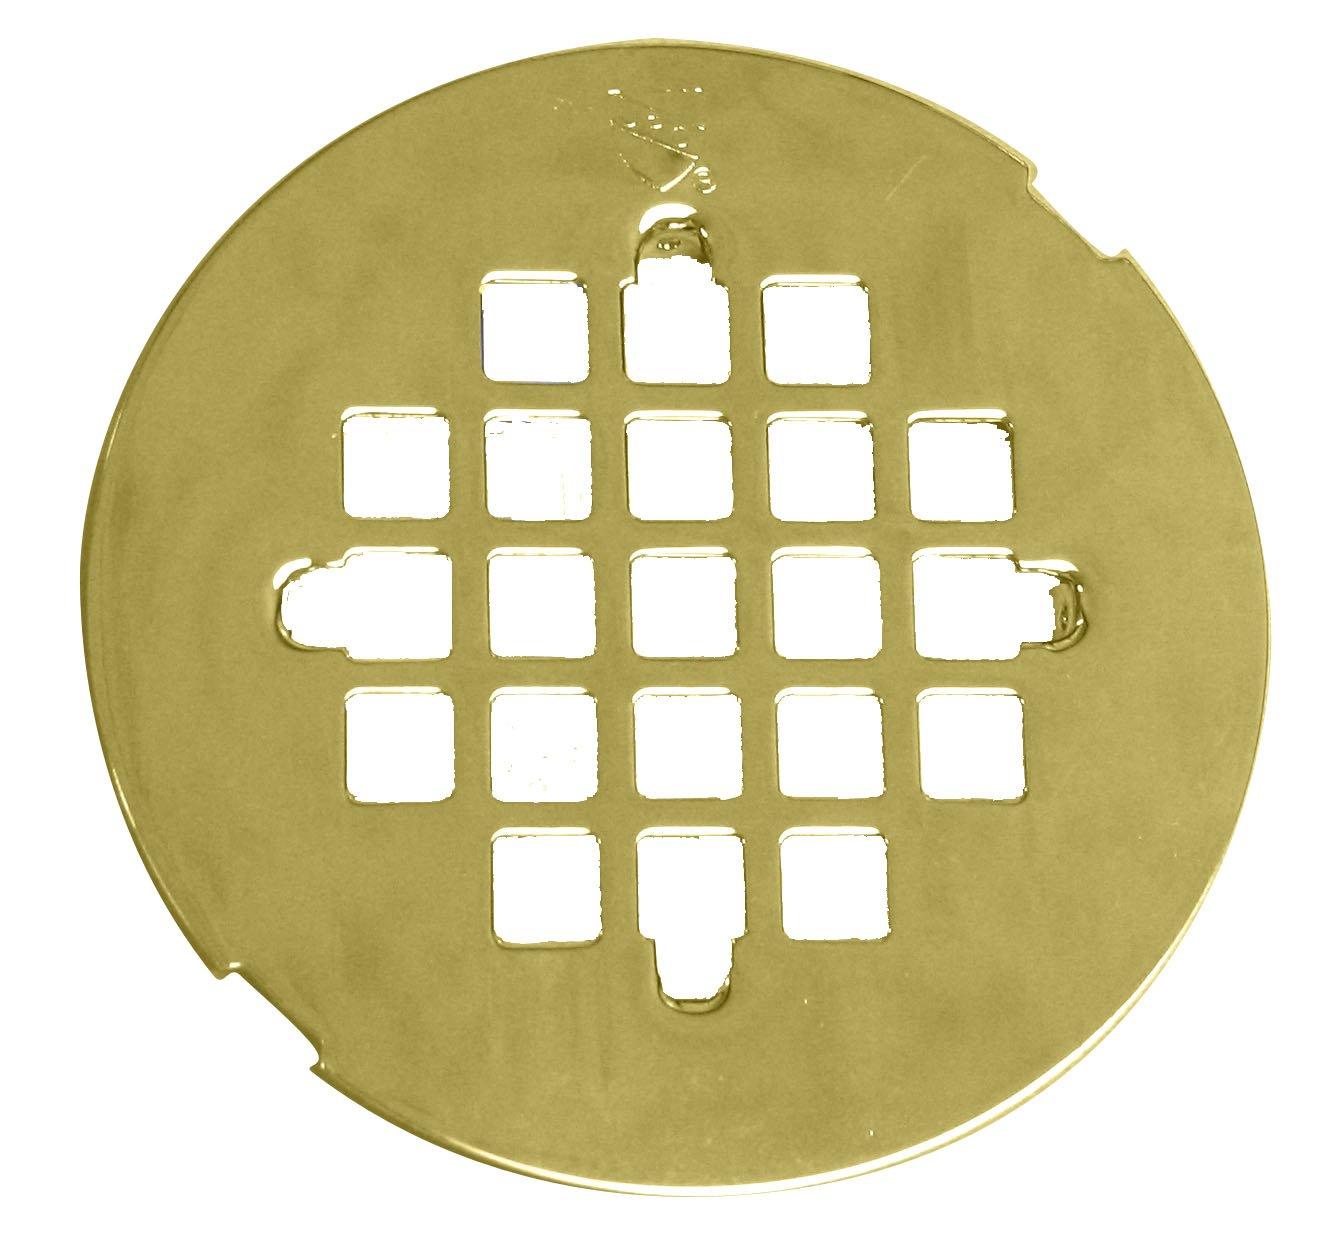 Westbrass 4-1/4'' OD Casper Brass Snap-In Shower Strainer Grid, Polished Brass, D319-01